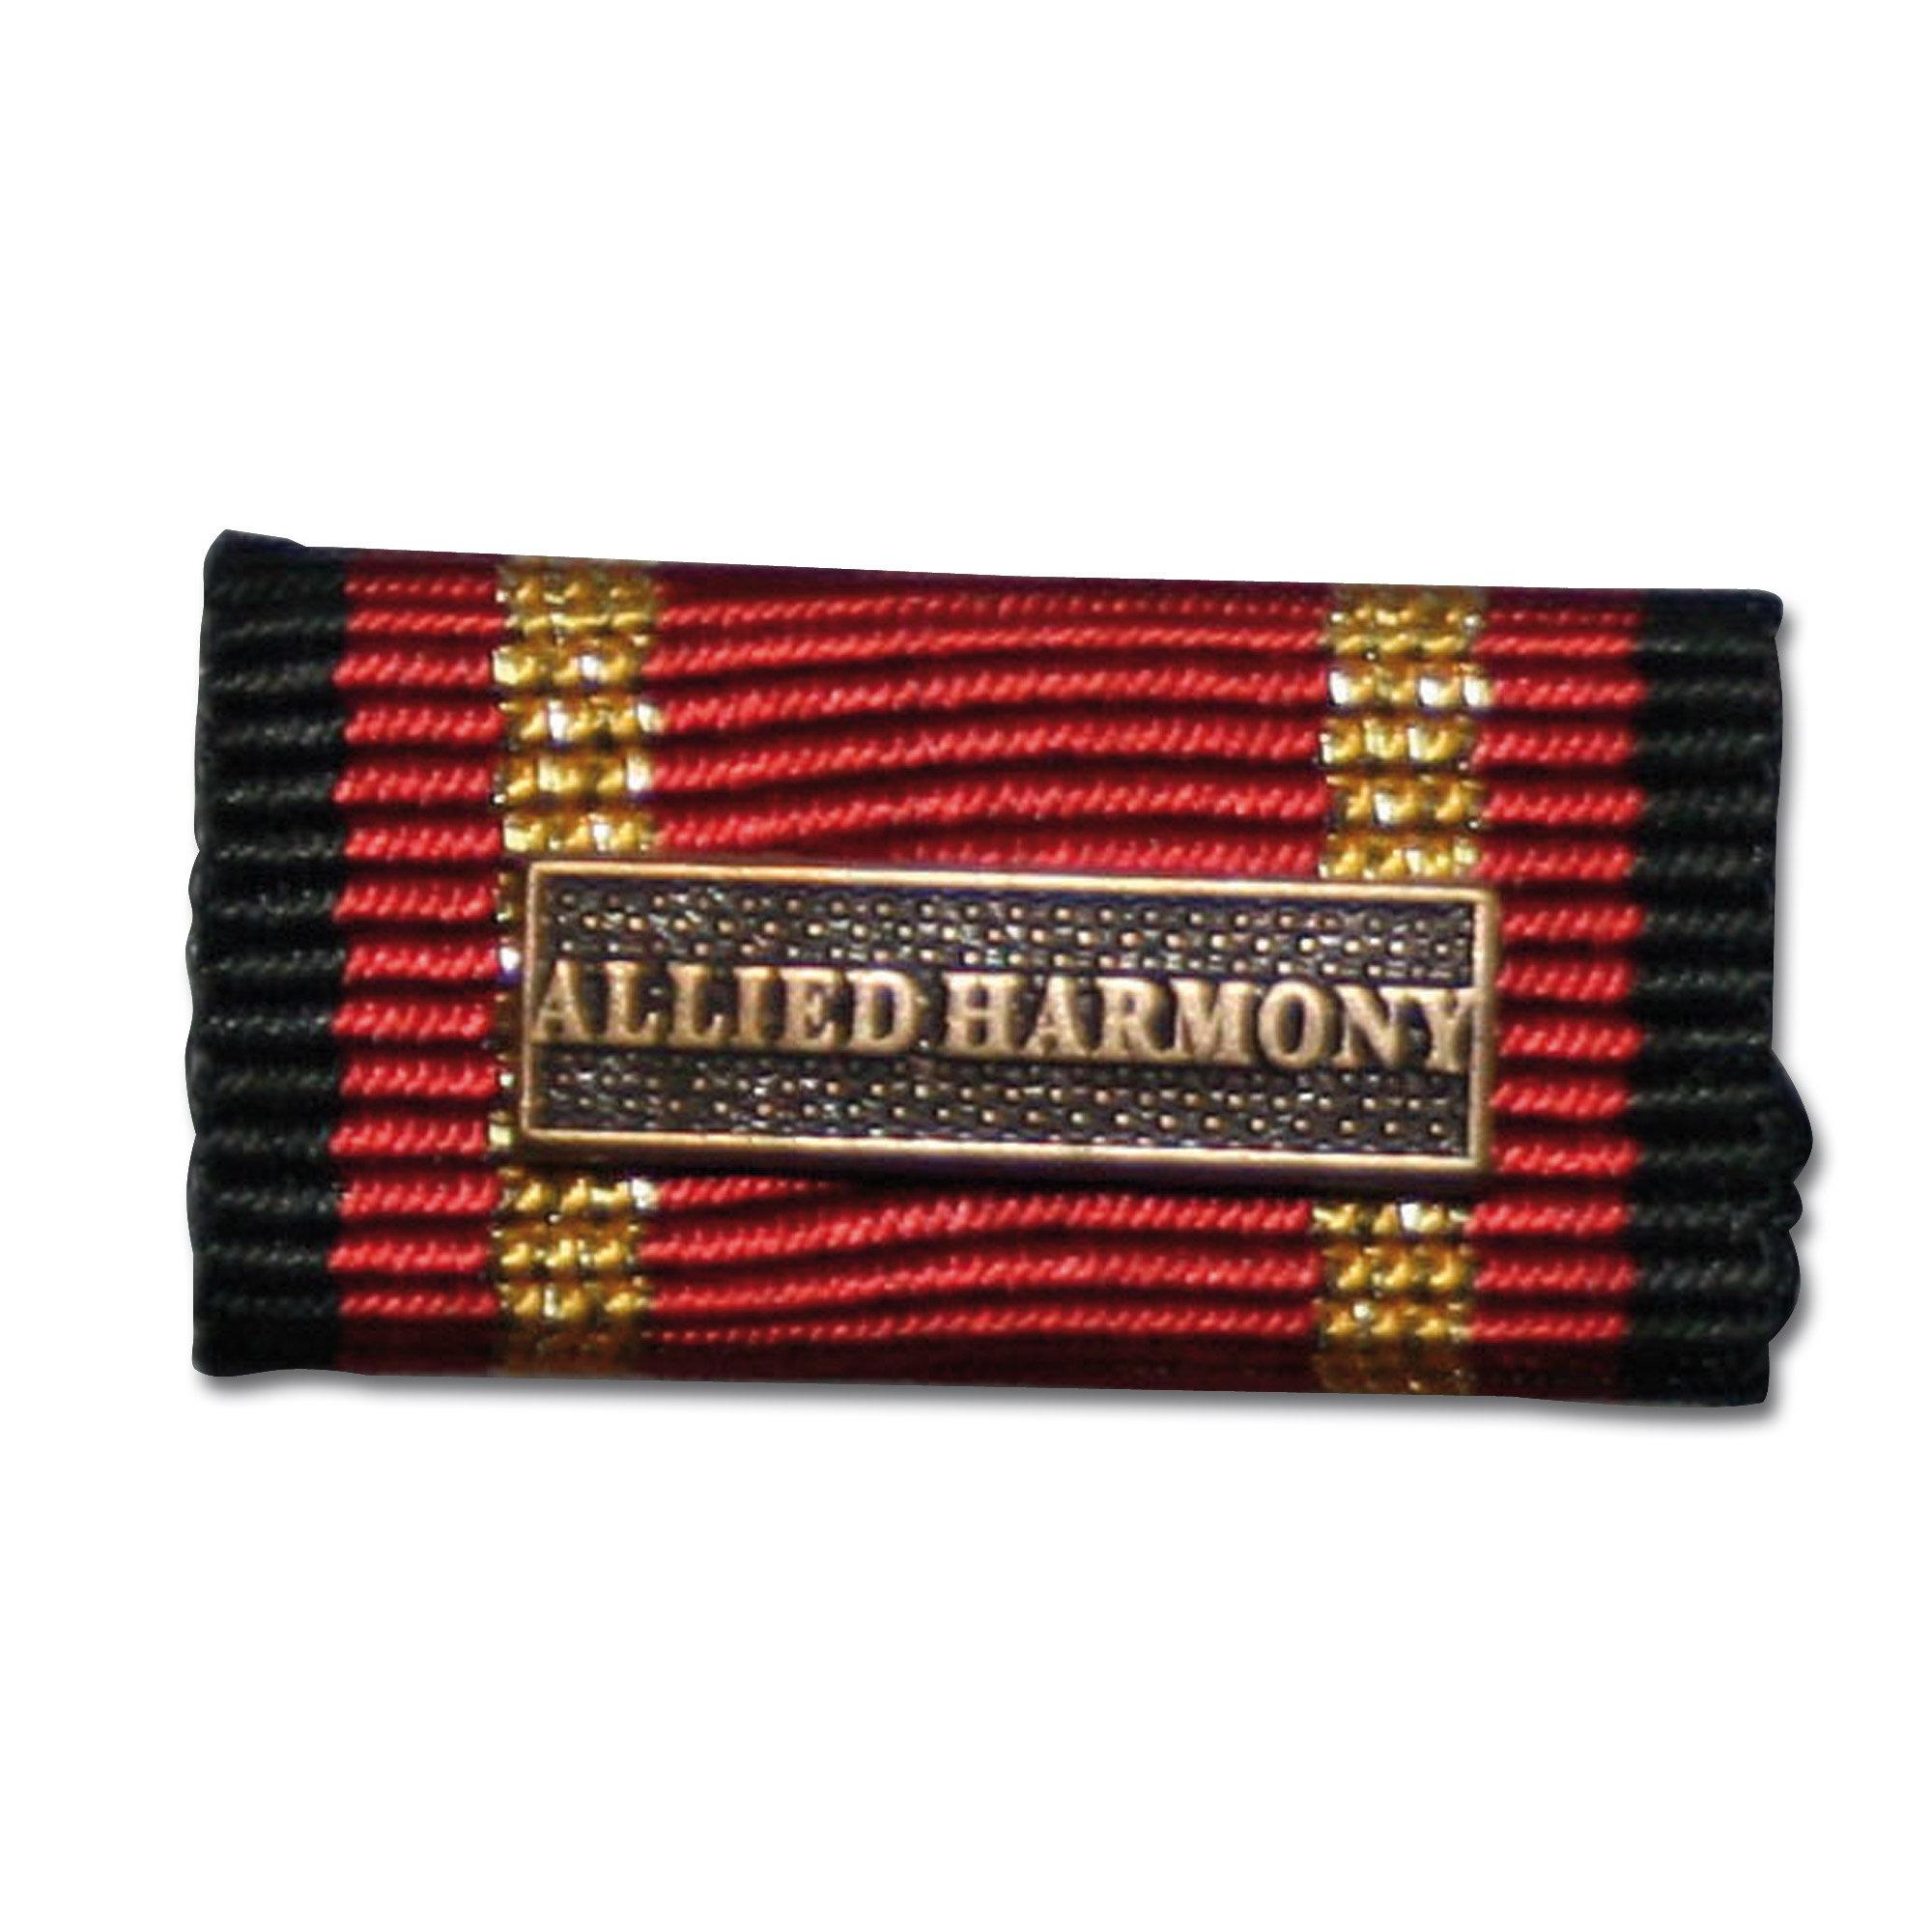 Service Ribbon Deployment Operation Allied Harmony